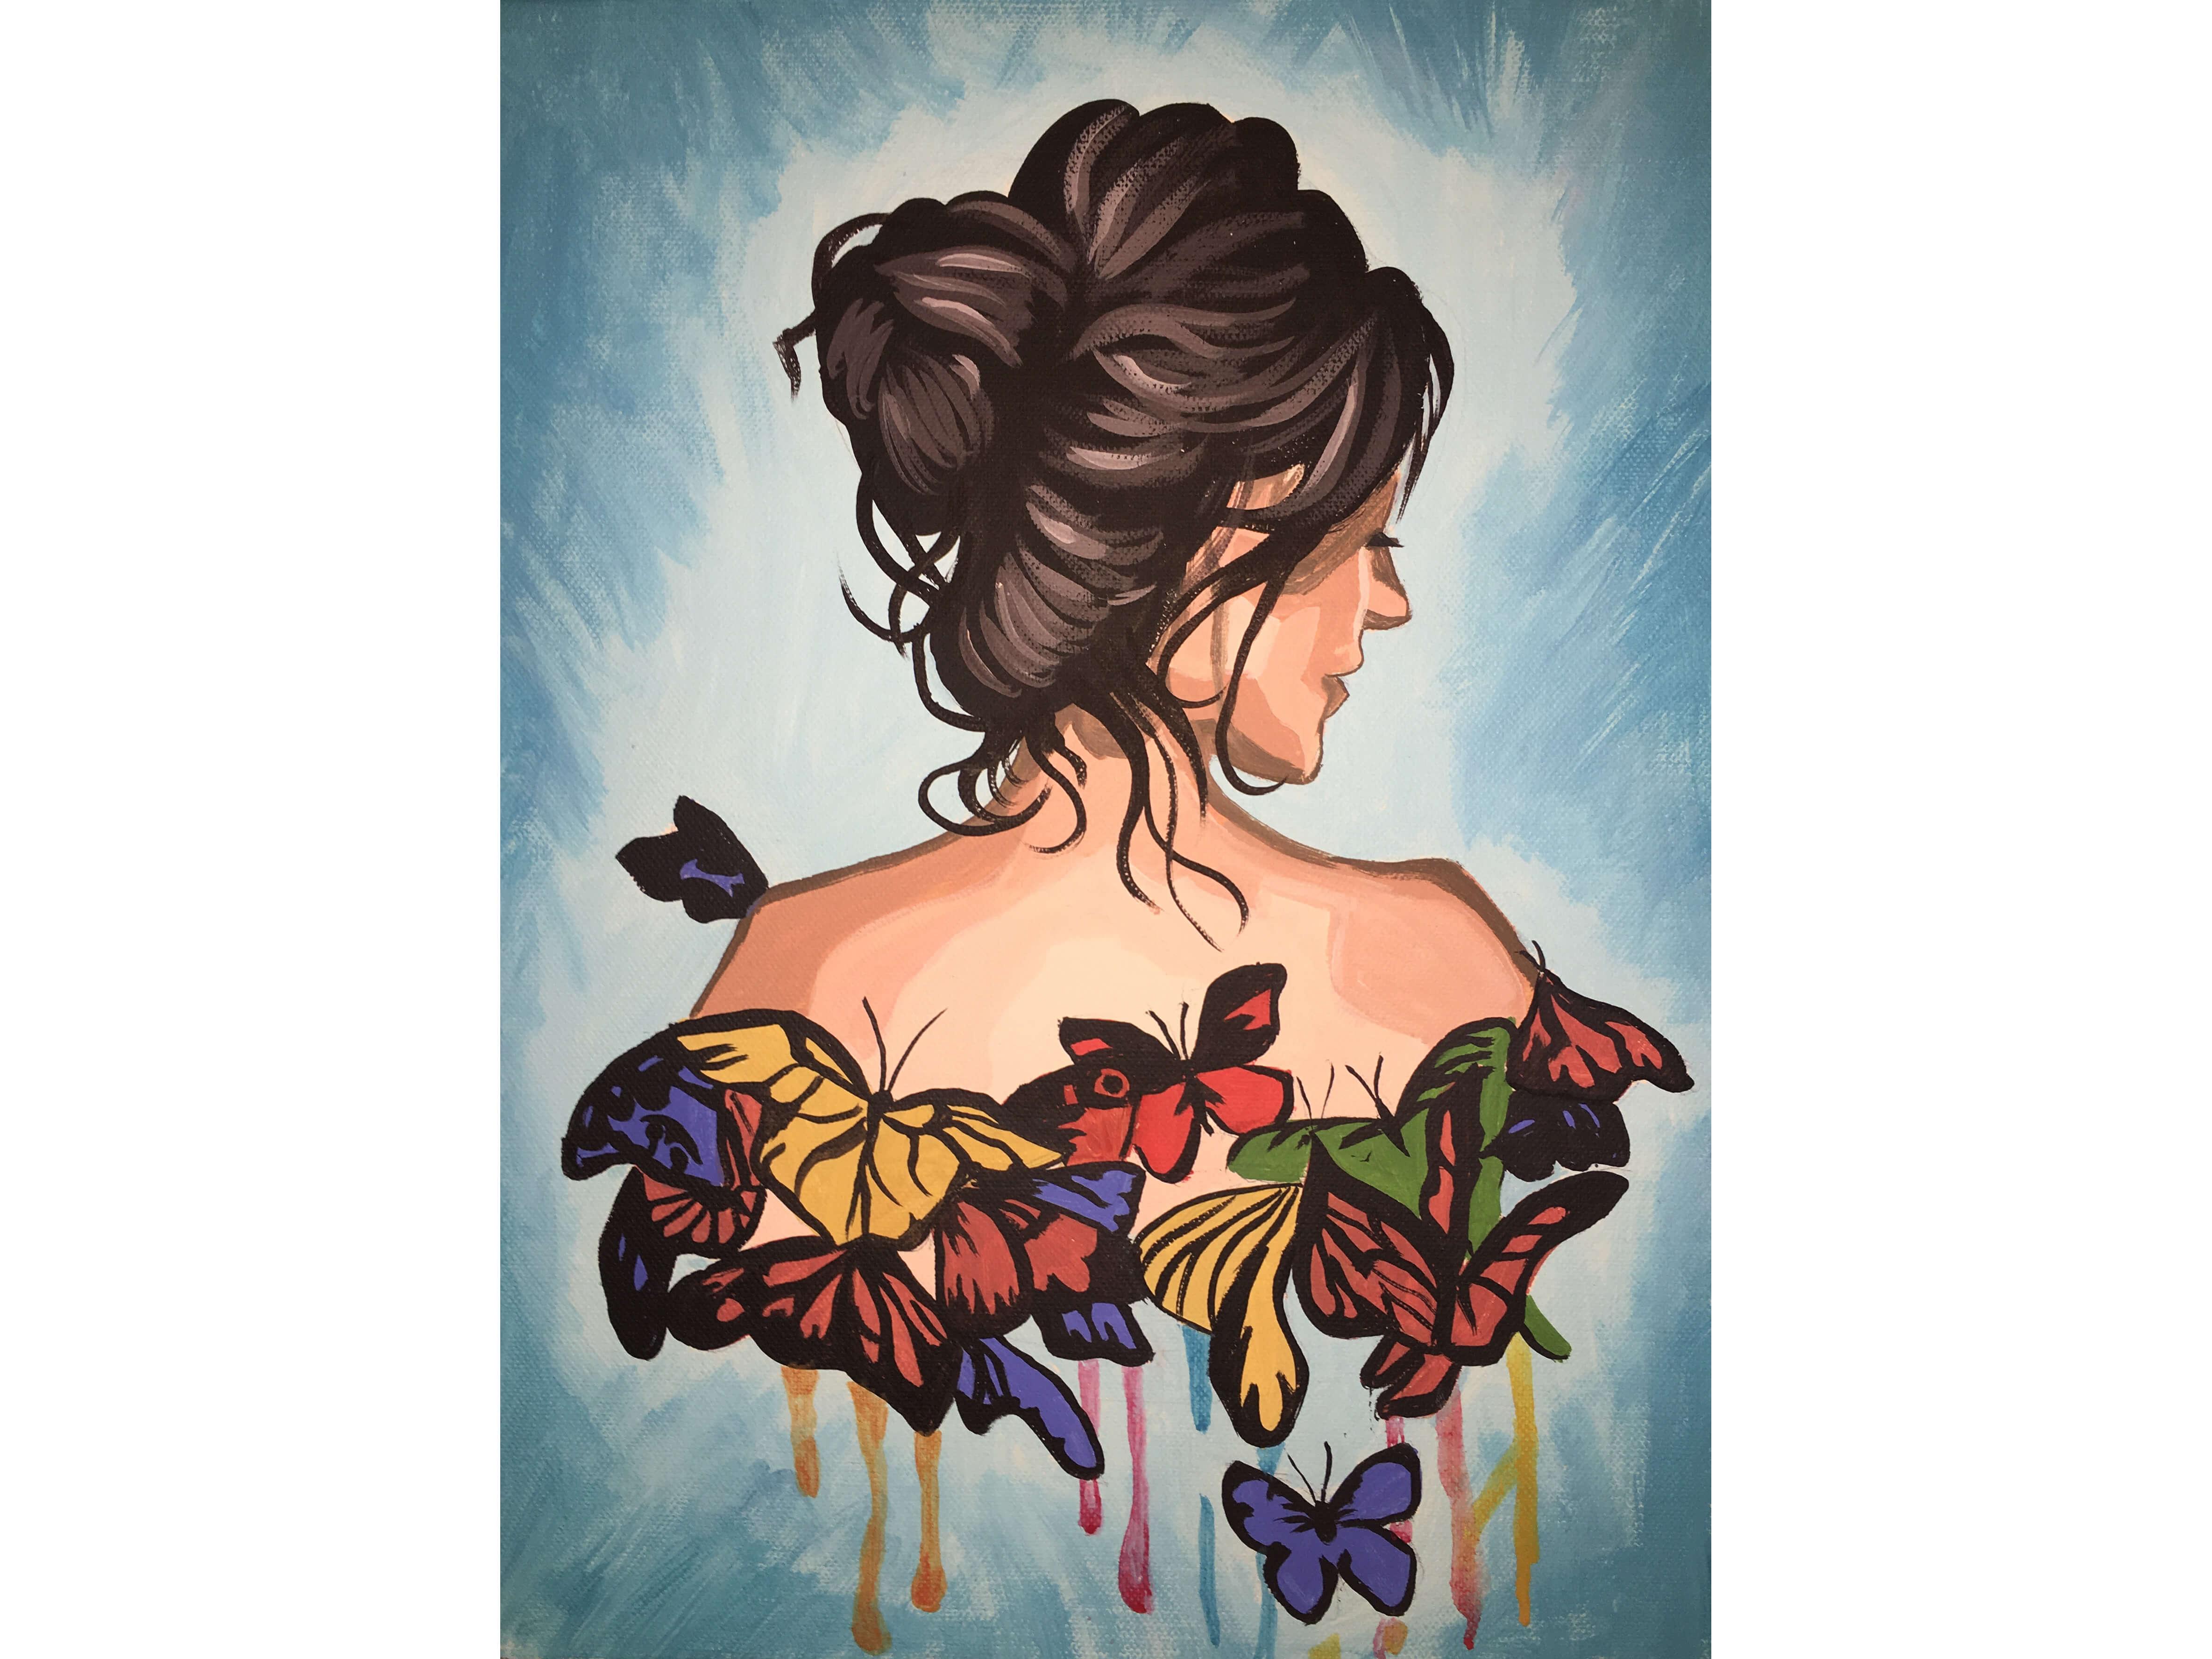 "Вино, забавление и рисуване с акрил в поп арт стил  ""Момиче с пеперуди"" 17.04.2021 г."